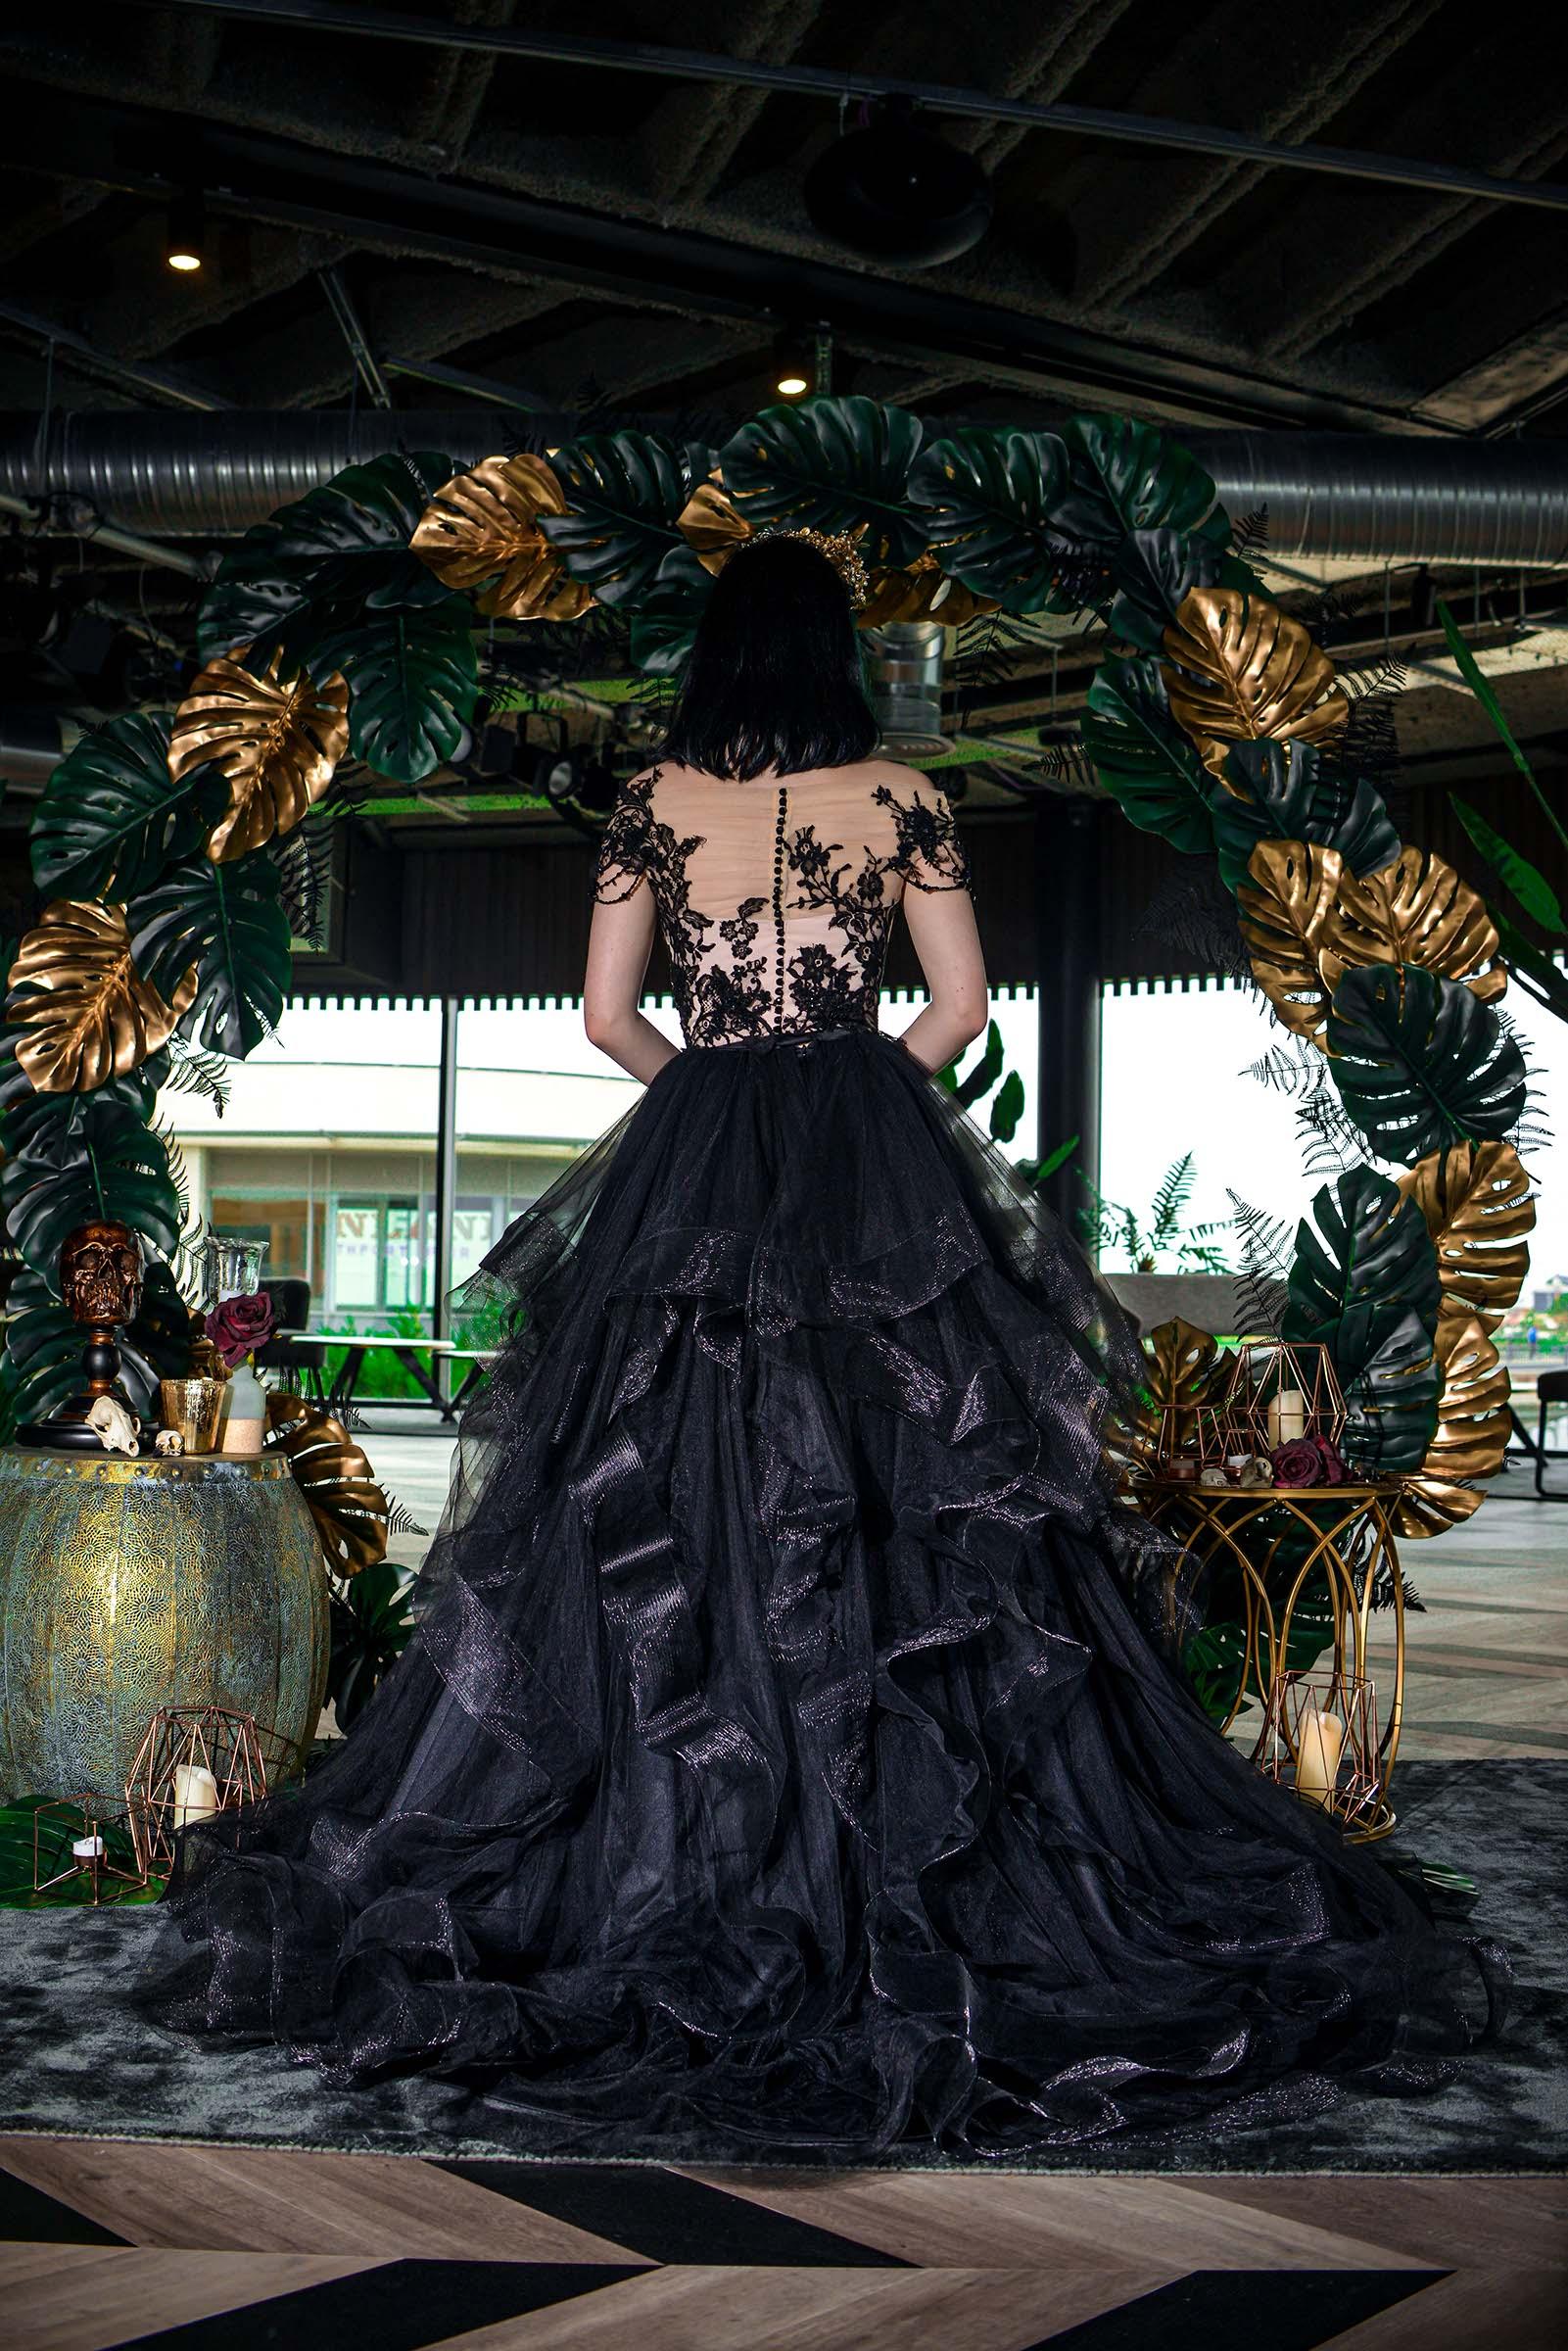 alternative luxe wedding - slytherin wedding - gothic wedding - alternative wedding - black wedding dress - gothic weding dress - alternative wedding dress